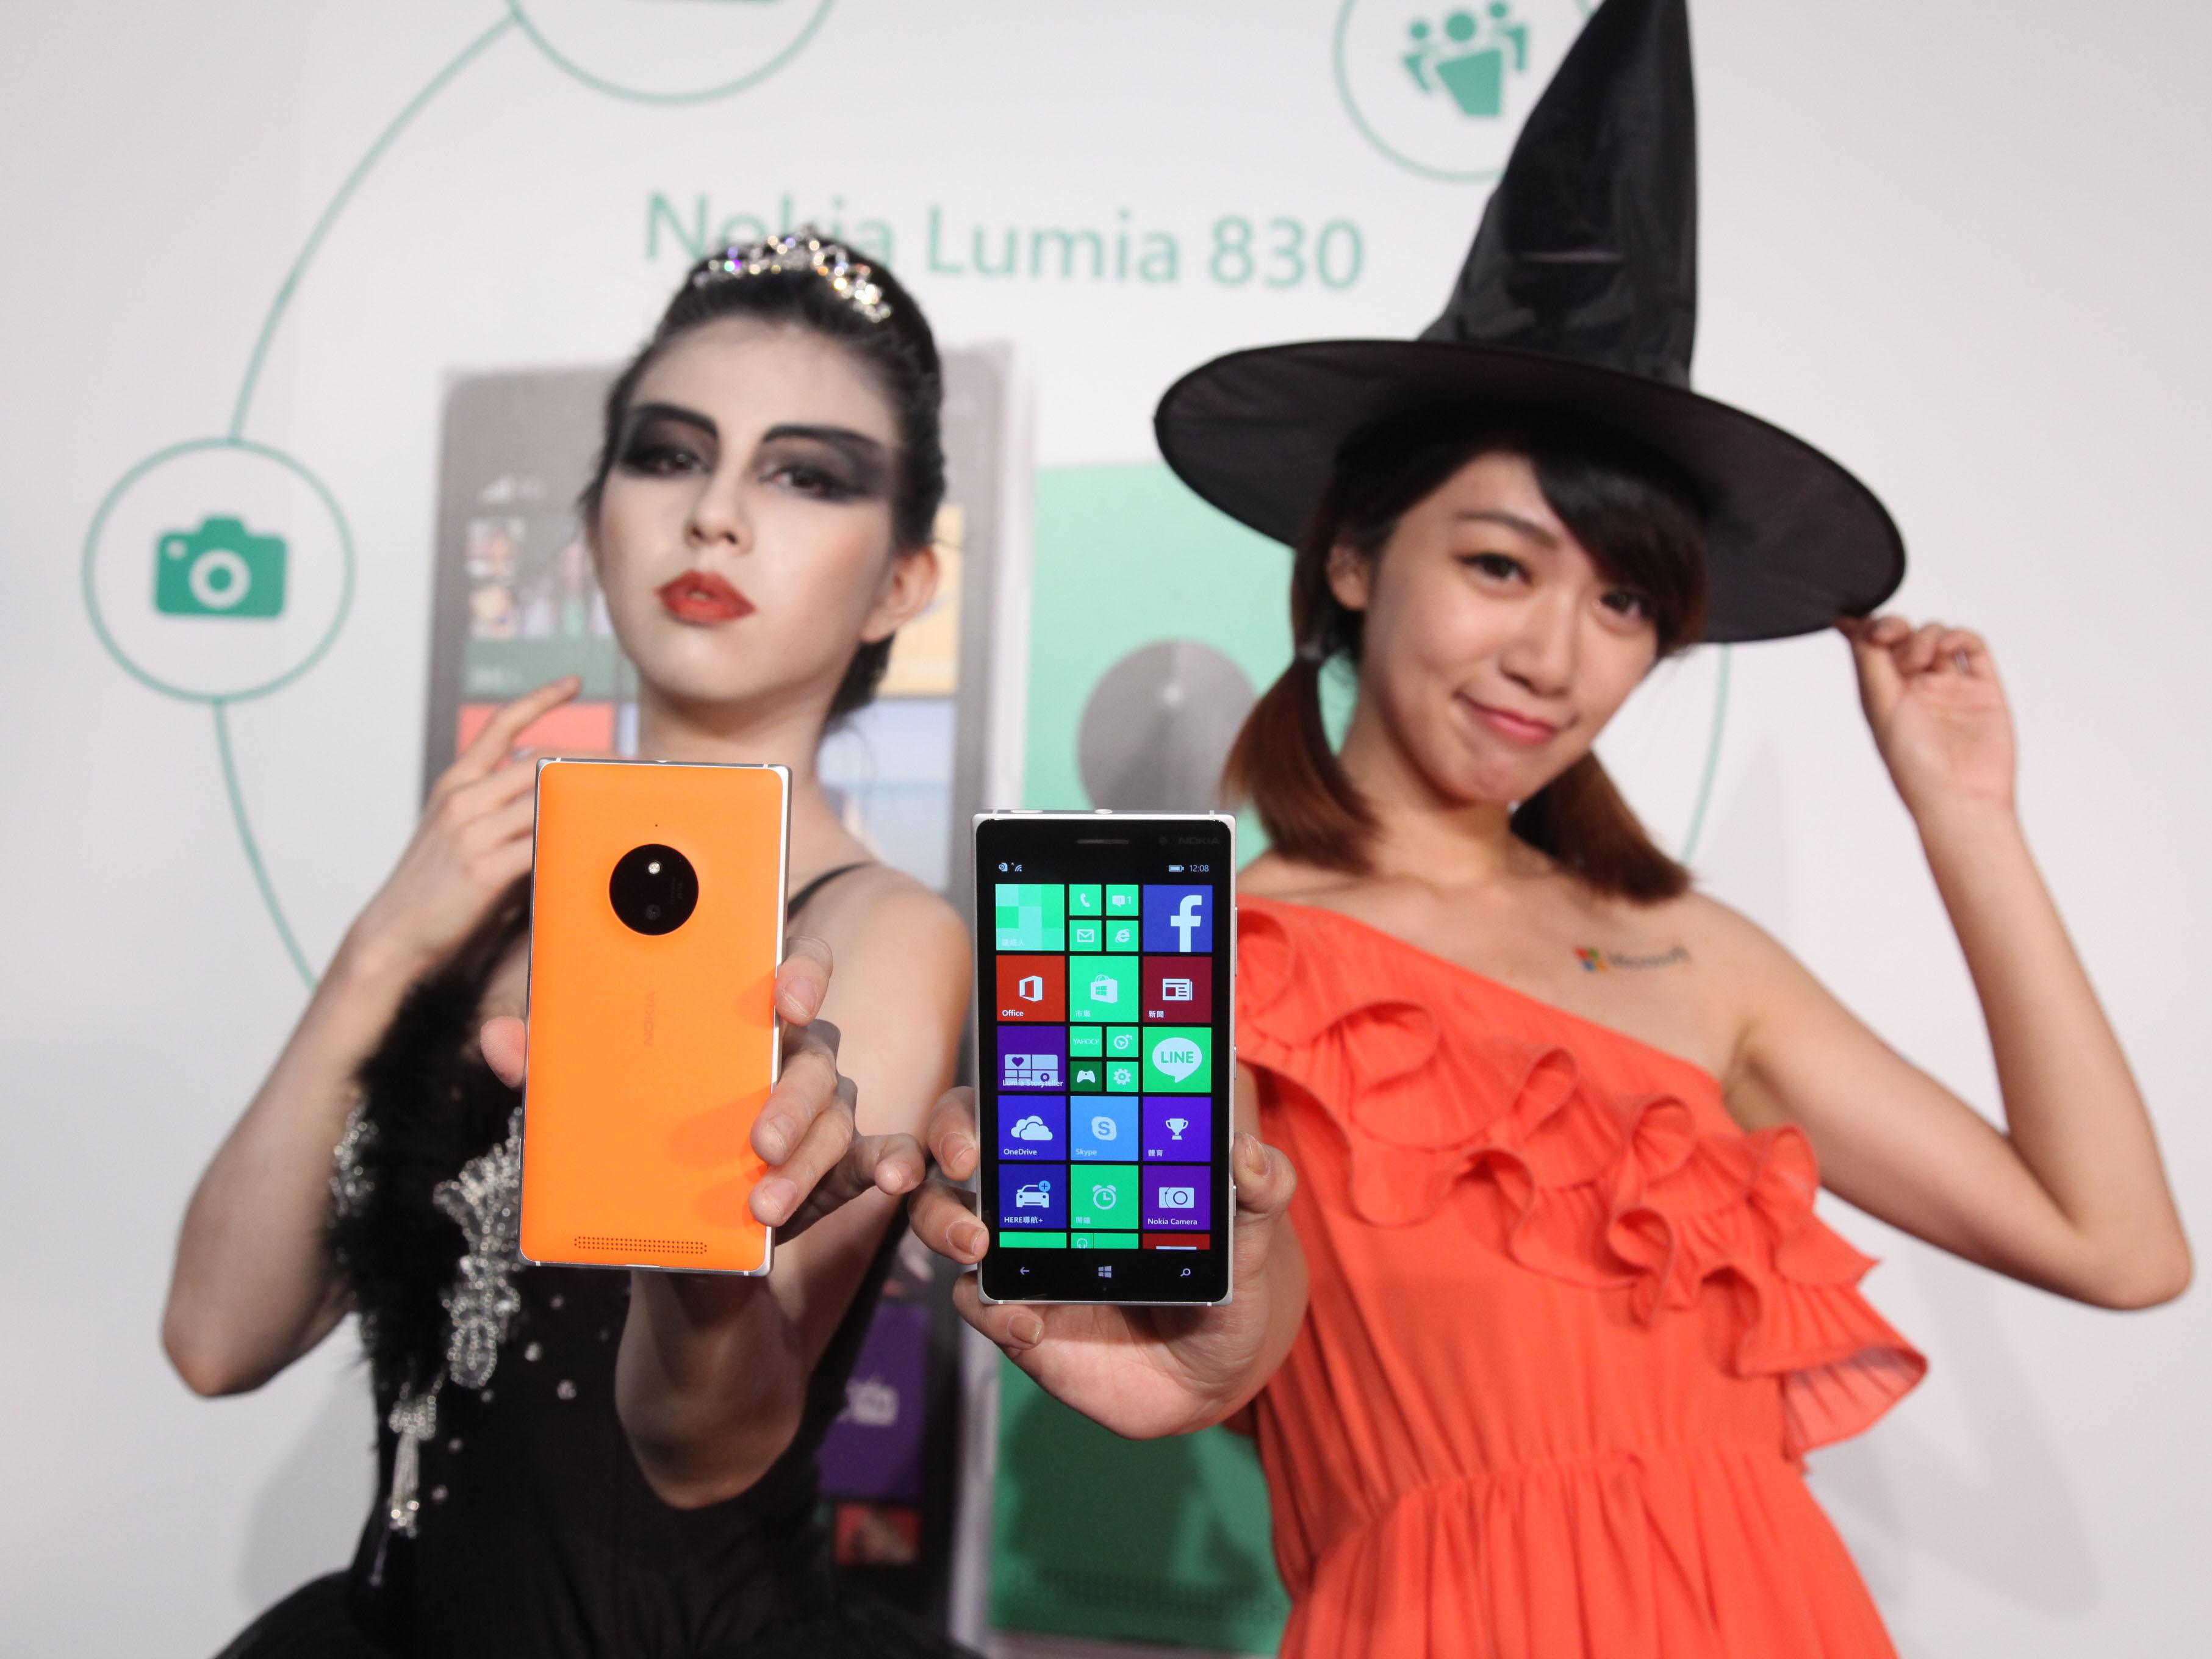 微軟 Nokia Lumia 830發表,LTE 全頻、搭載 PureView,台幣12,900元